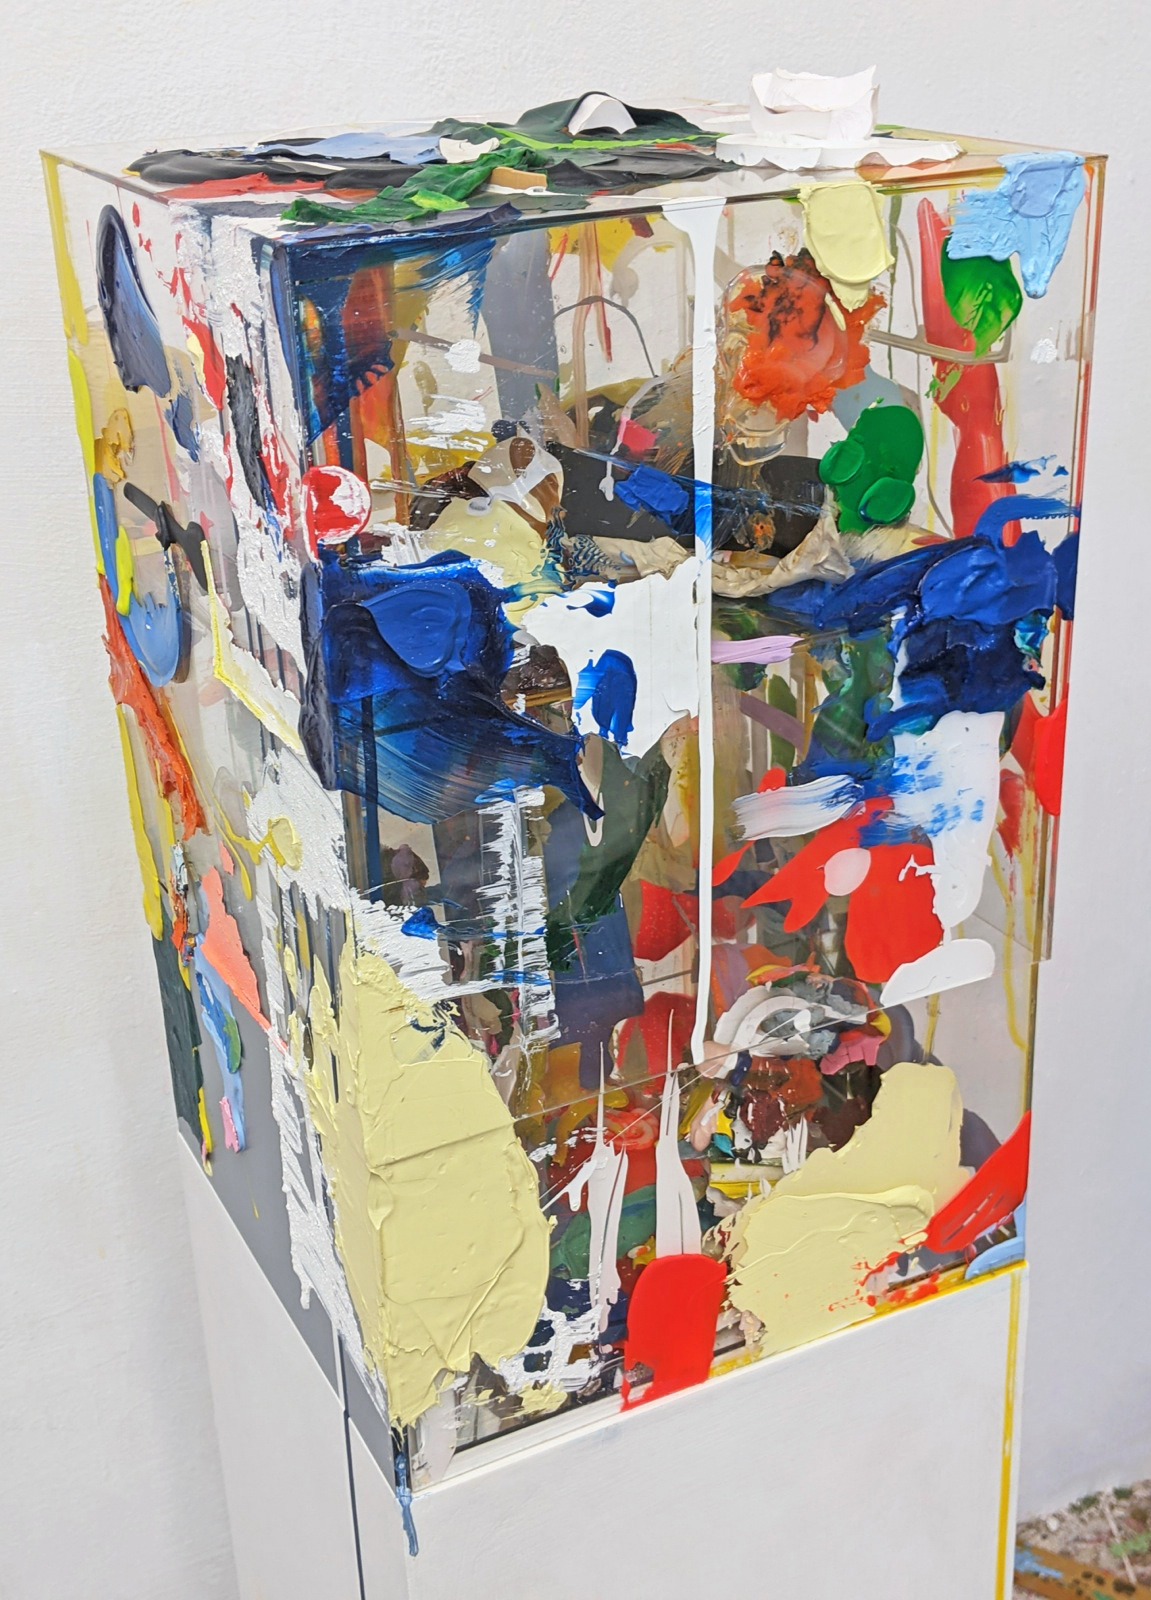 Farbstele nah, 30x30x120 cm, Acrylfarbe, Holz, Plexi, 2017